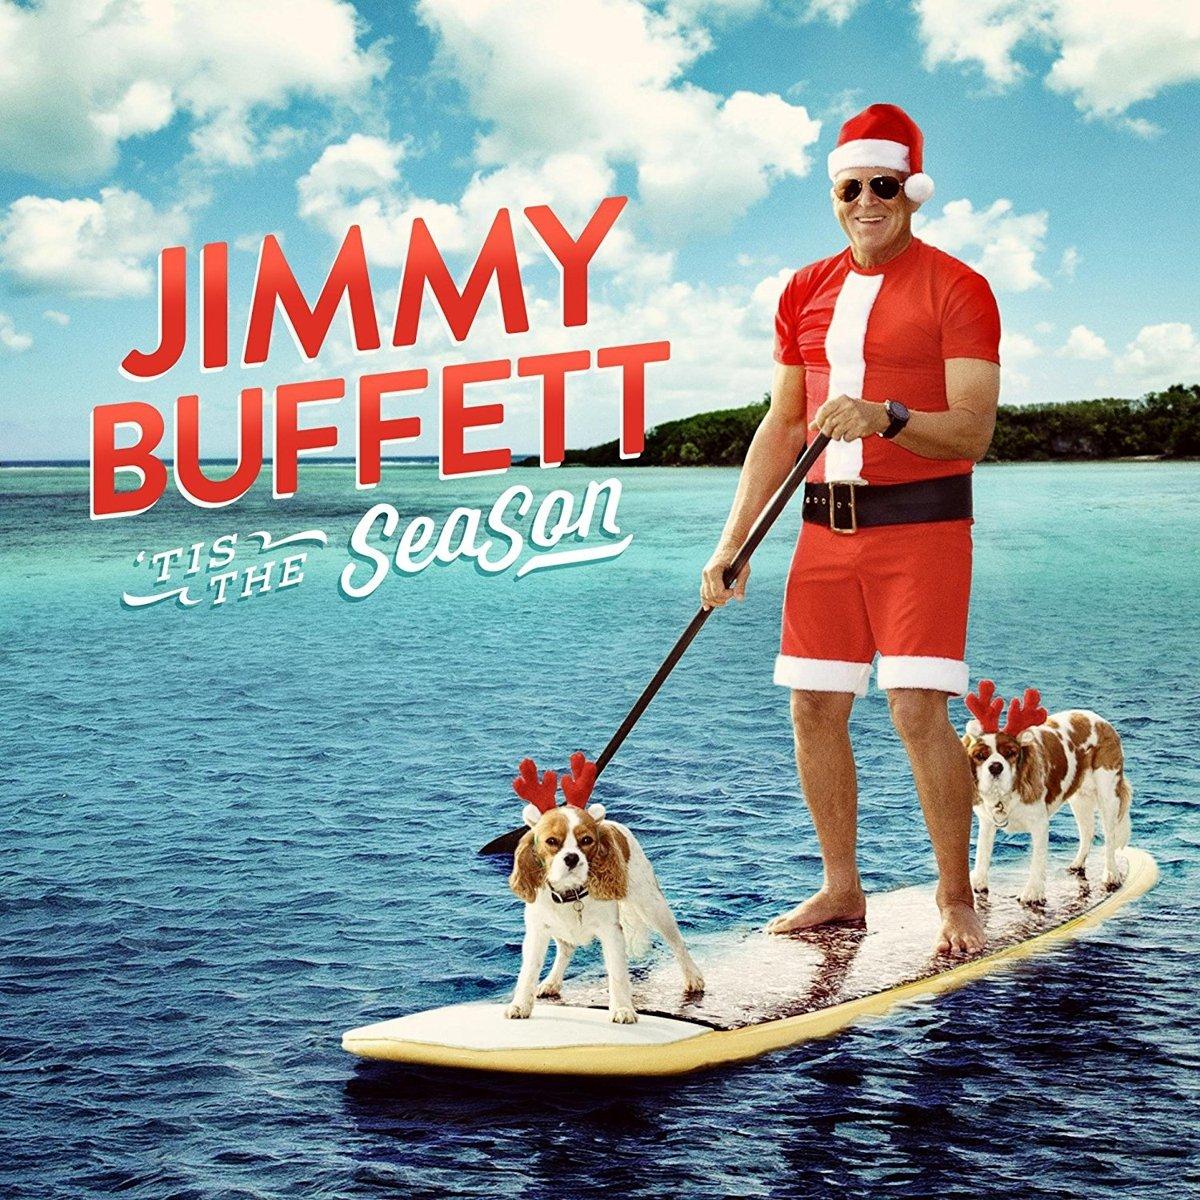 amazon tis the season jimmy buffett クリスマス 音楽